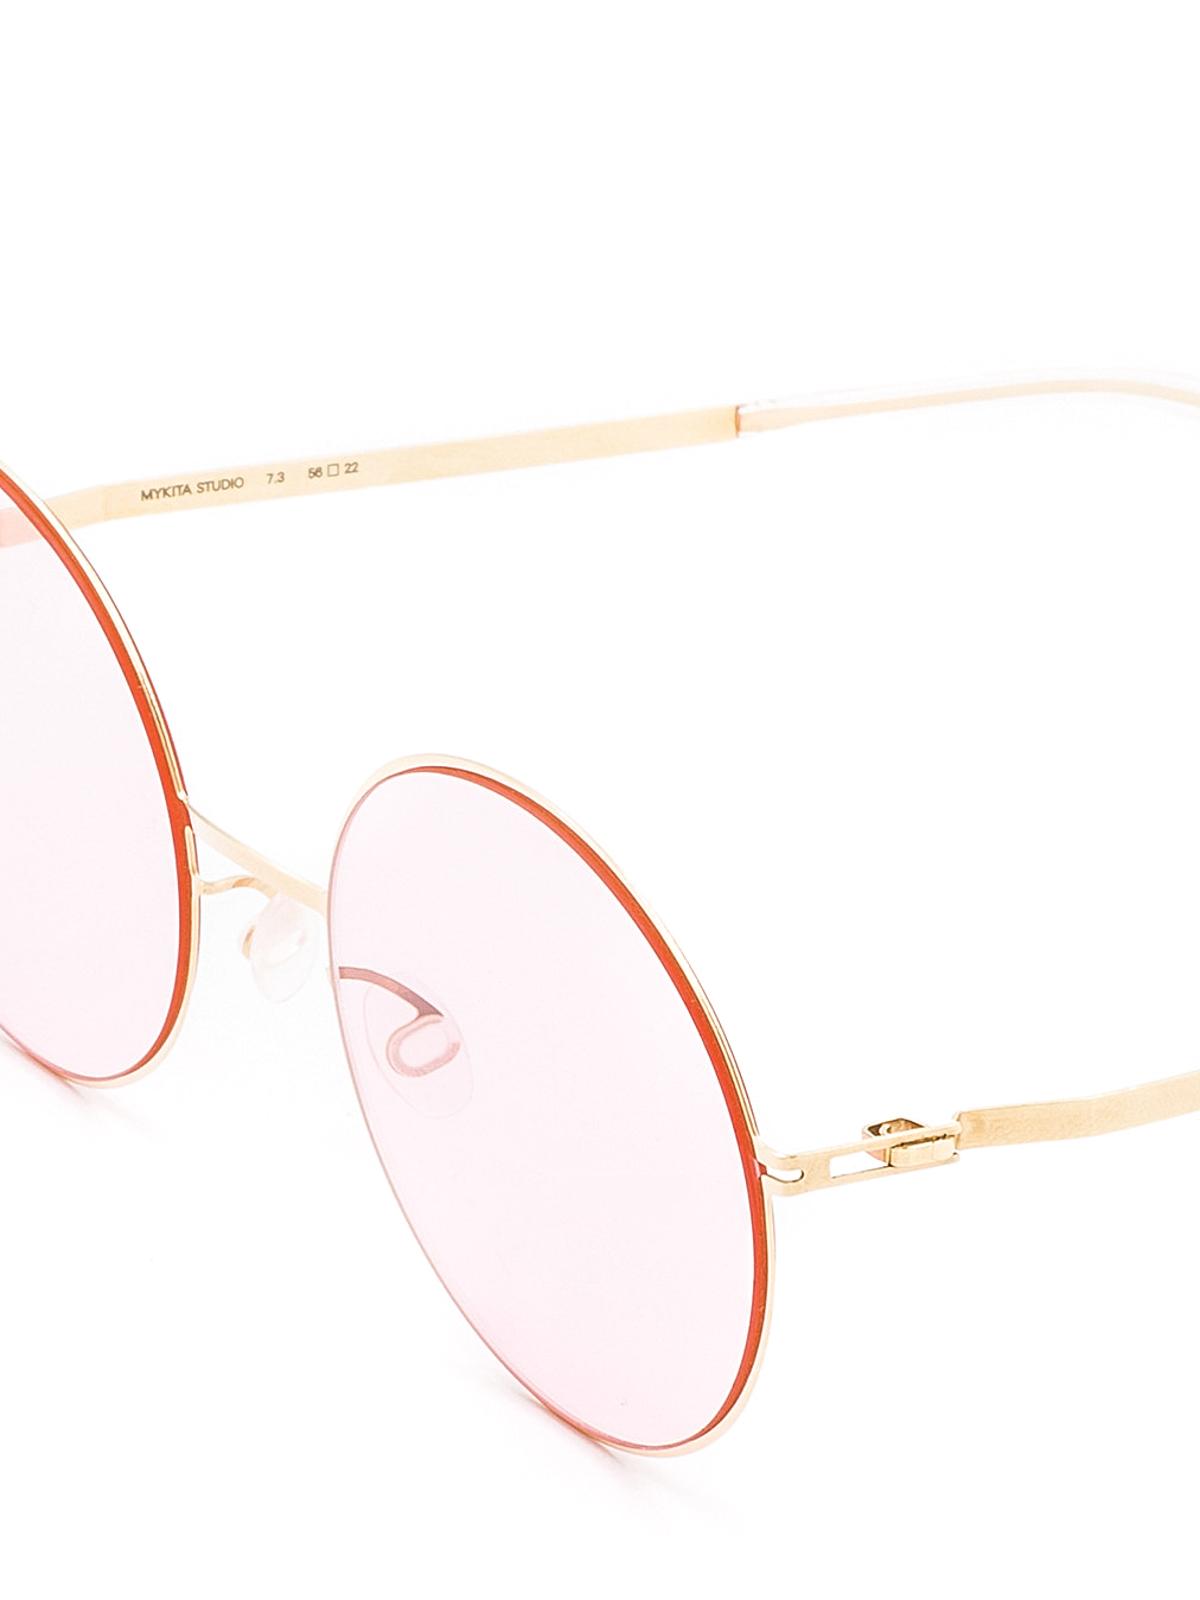 d93558146bc Mykita - Studio 7.3 oval-shaped sunglasses - sunglasses - STUDIO7313